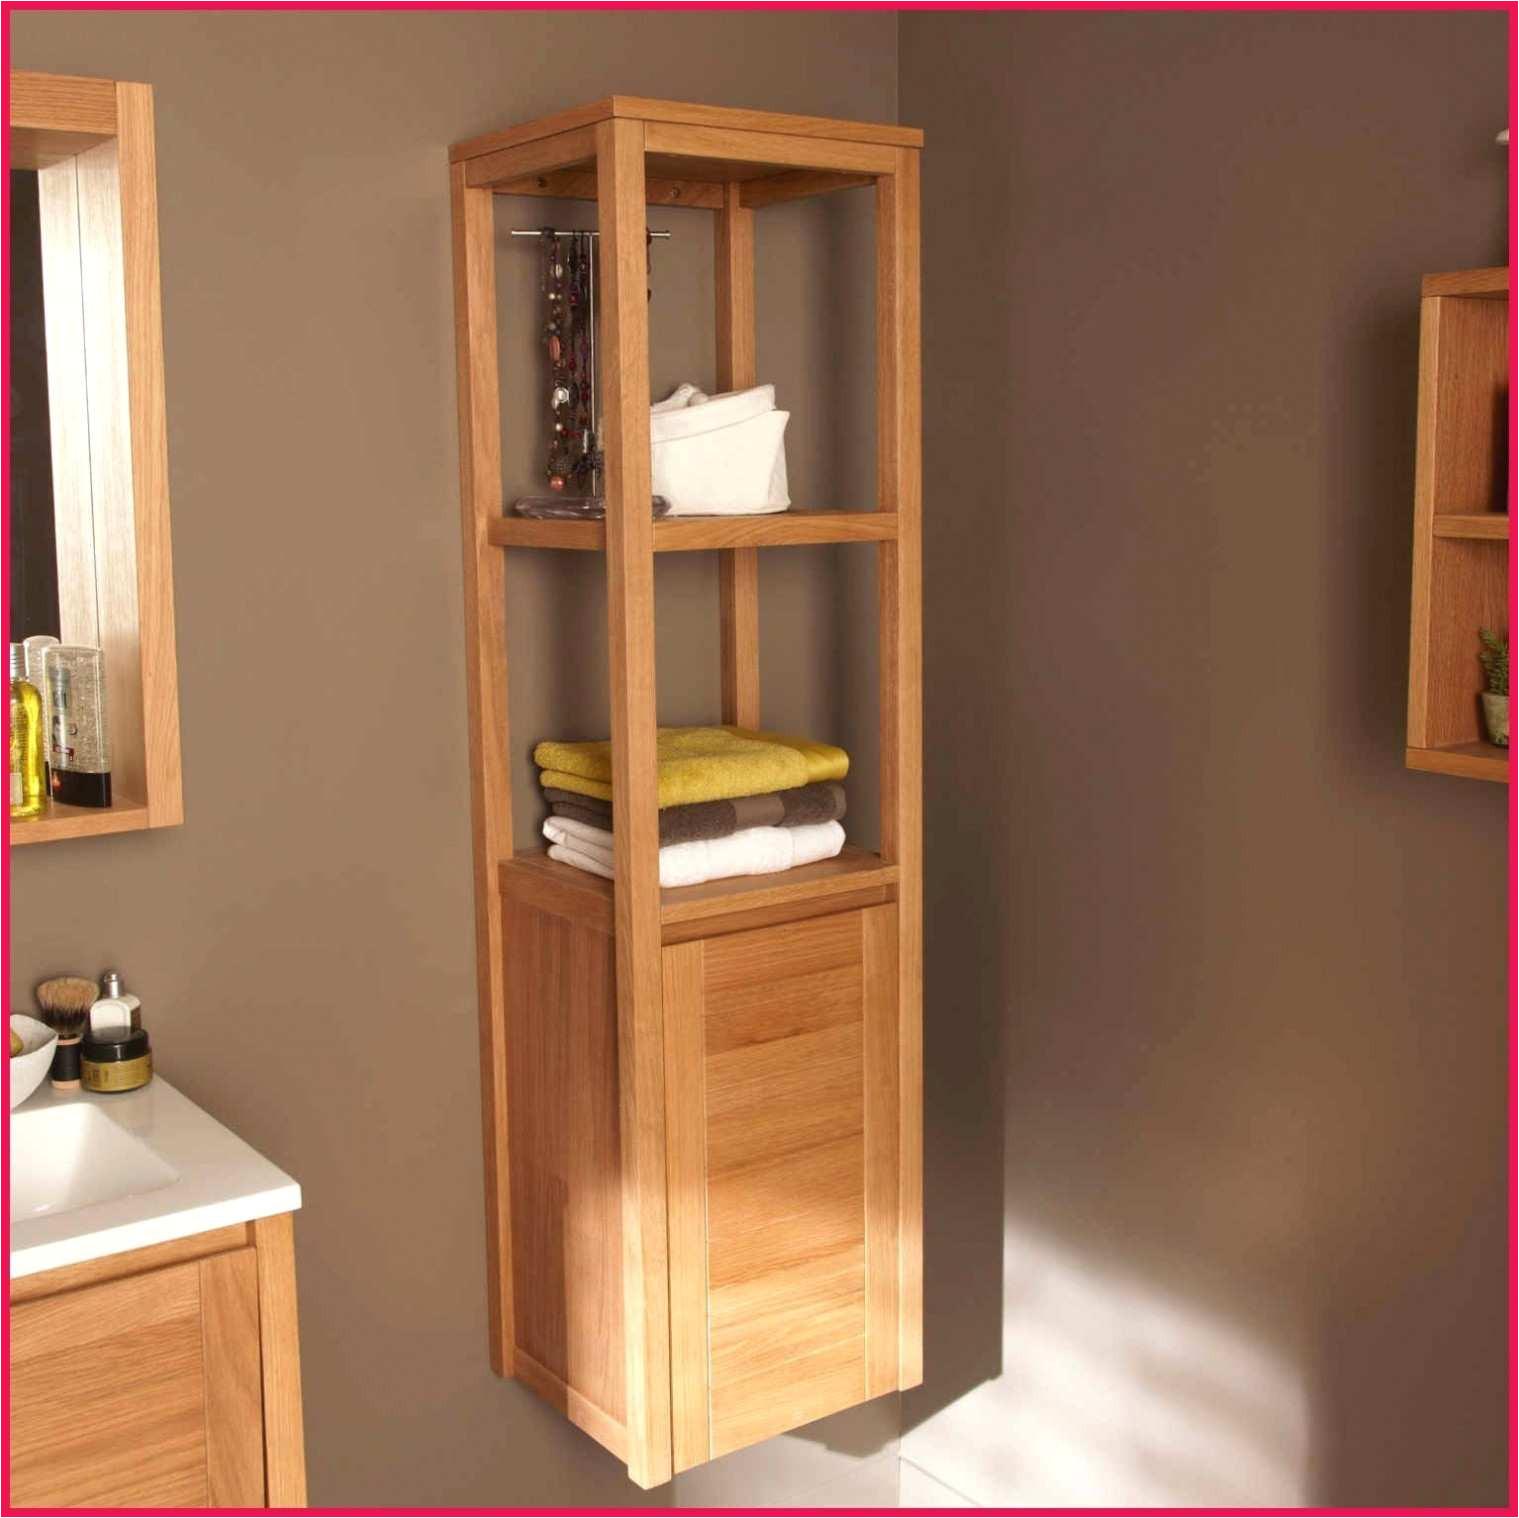 Puertas para closet de madera en home depot armario exterior segunda mano fresco inicio puertas - Armario de madera para exterior ...